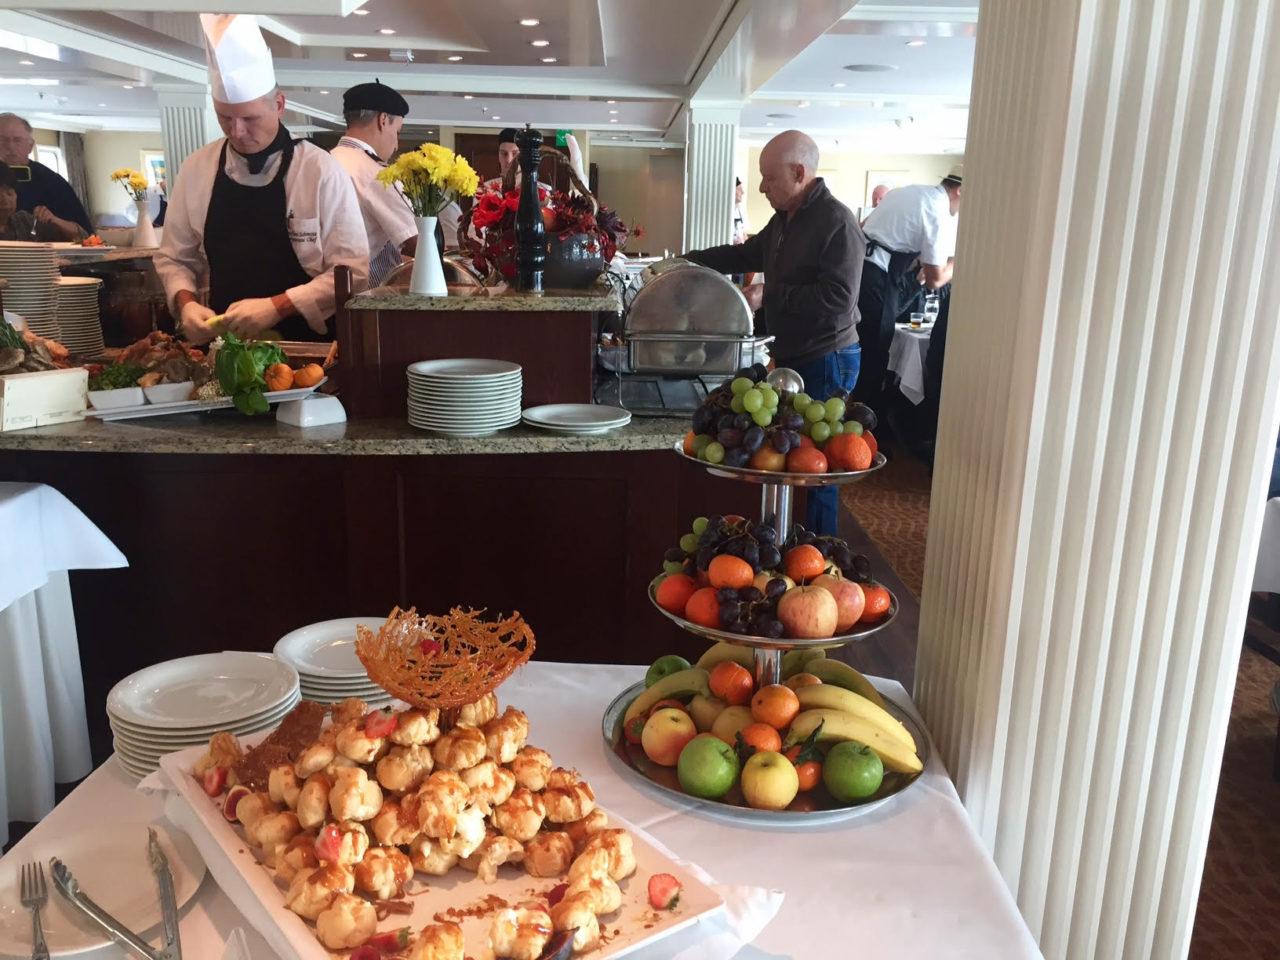 Croque-en-Bouche and Fruit platters ~ Paris and Normandie AmaWaterways Cruise